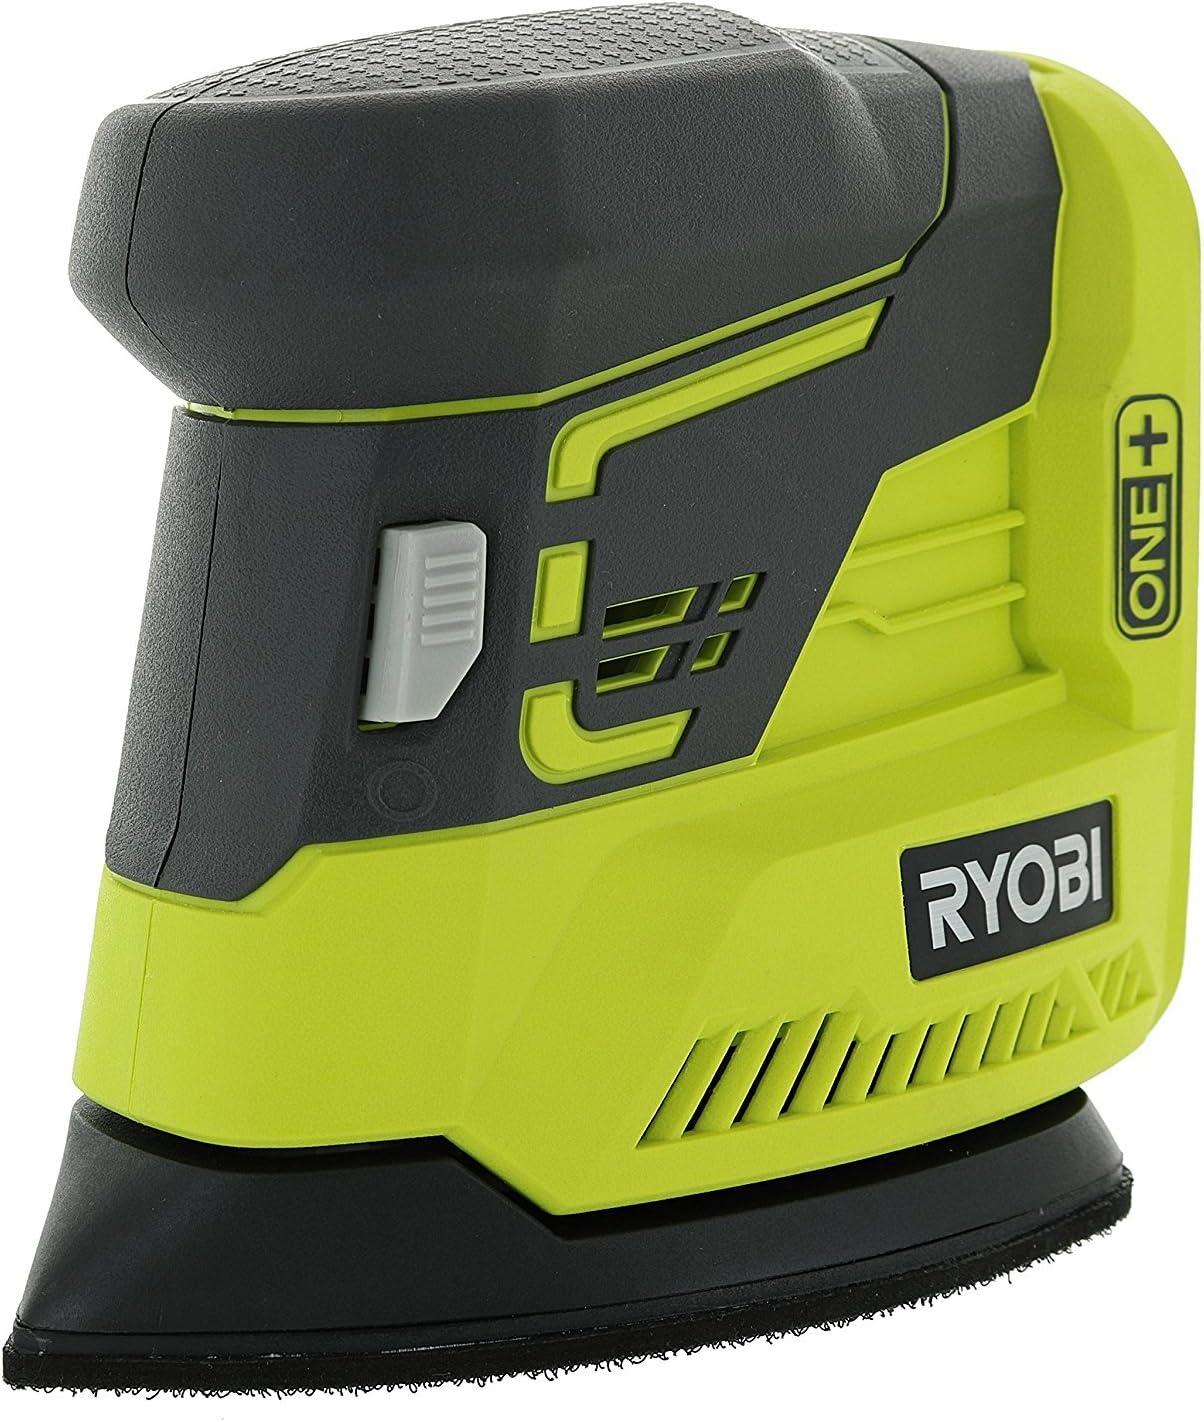 Ryobi P401 featured image 4